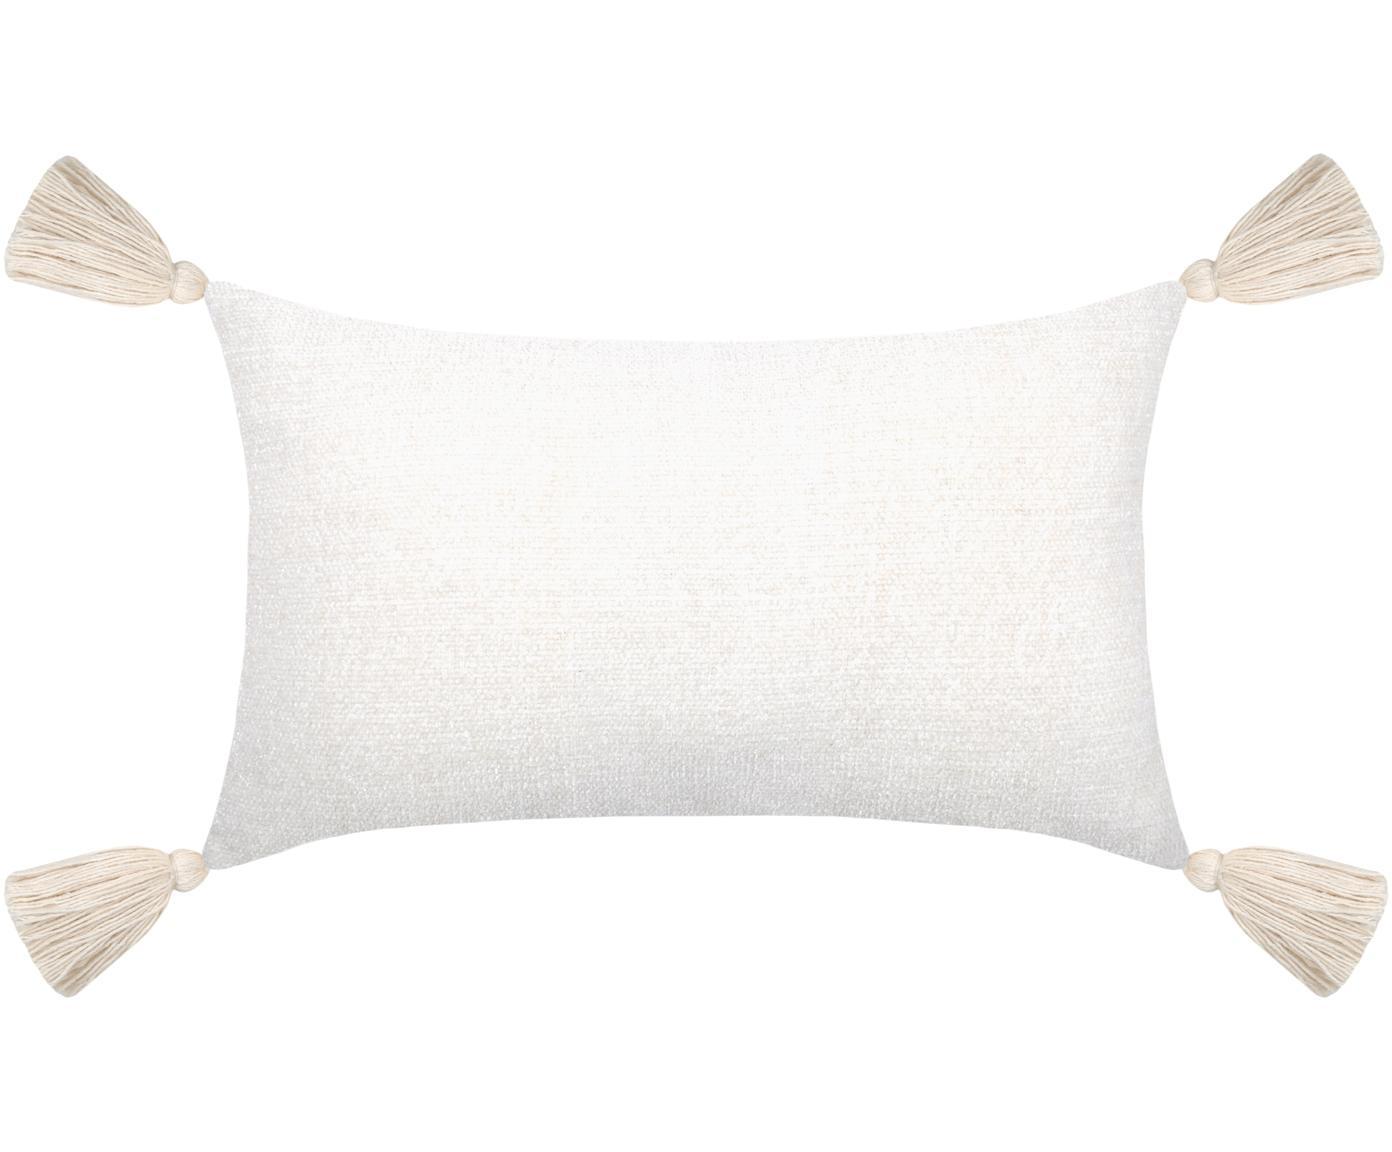 Cojín con borlas Chila, con relleno, Funda: 95%poliéster, 5%algodón, Blanco, An 30 x L 50 cm